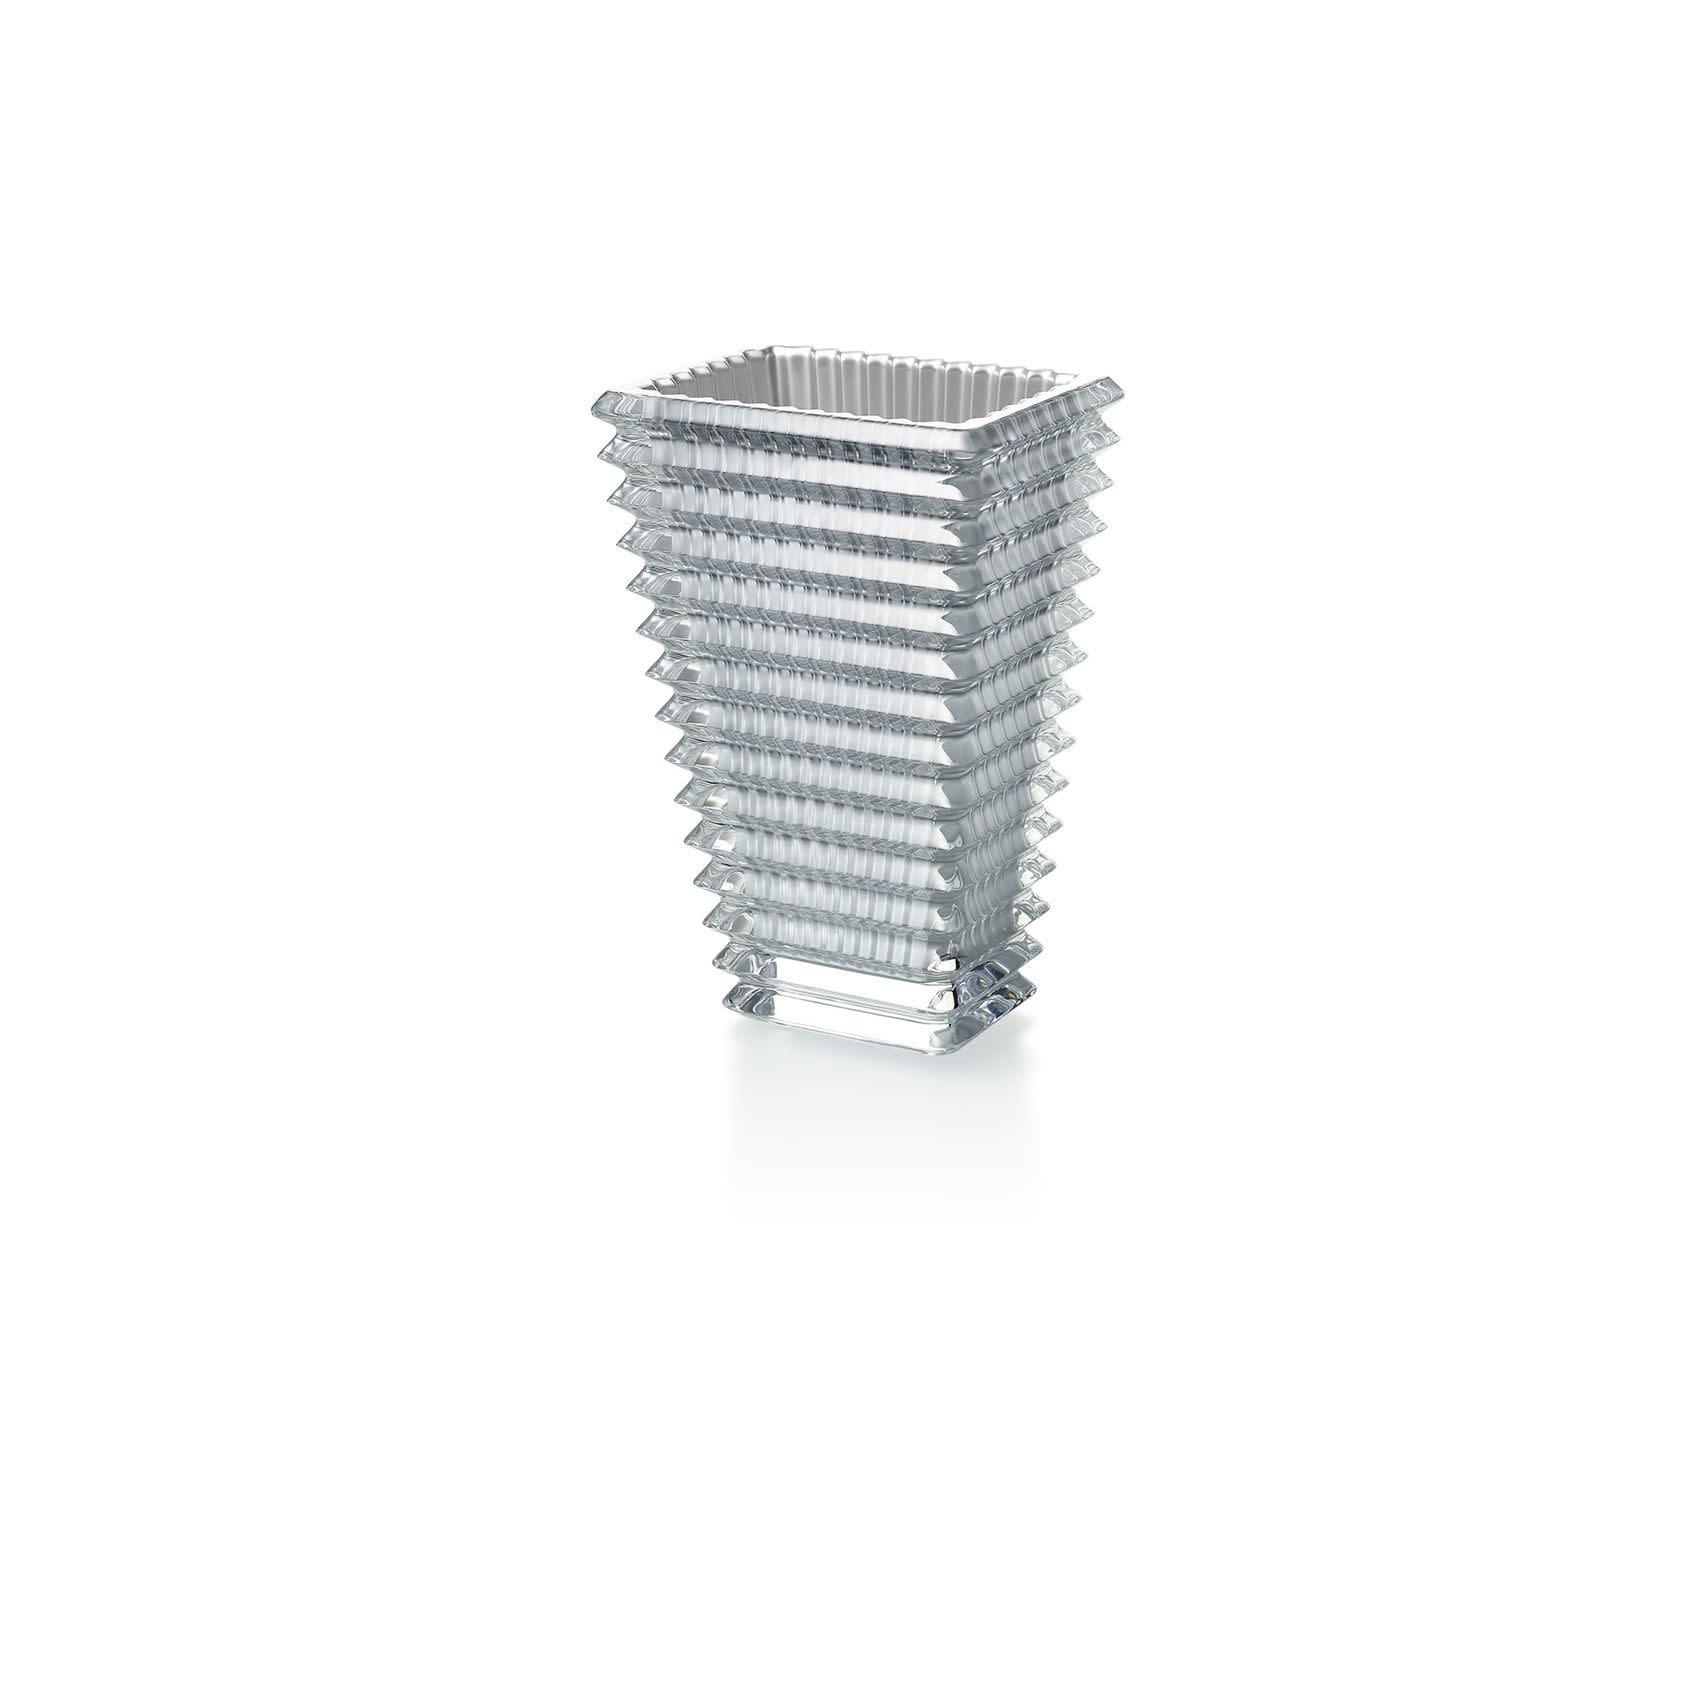 Baccarat Eye Vase Silver Small